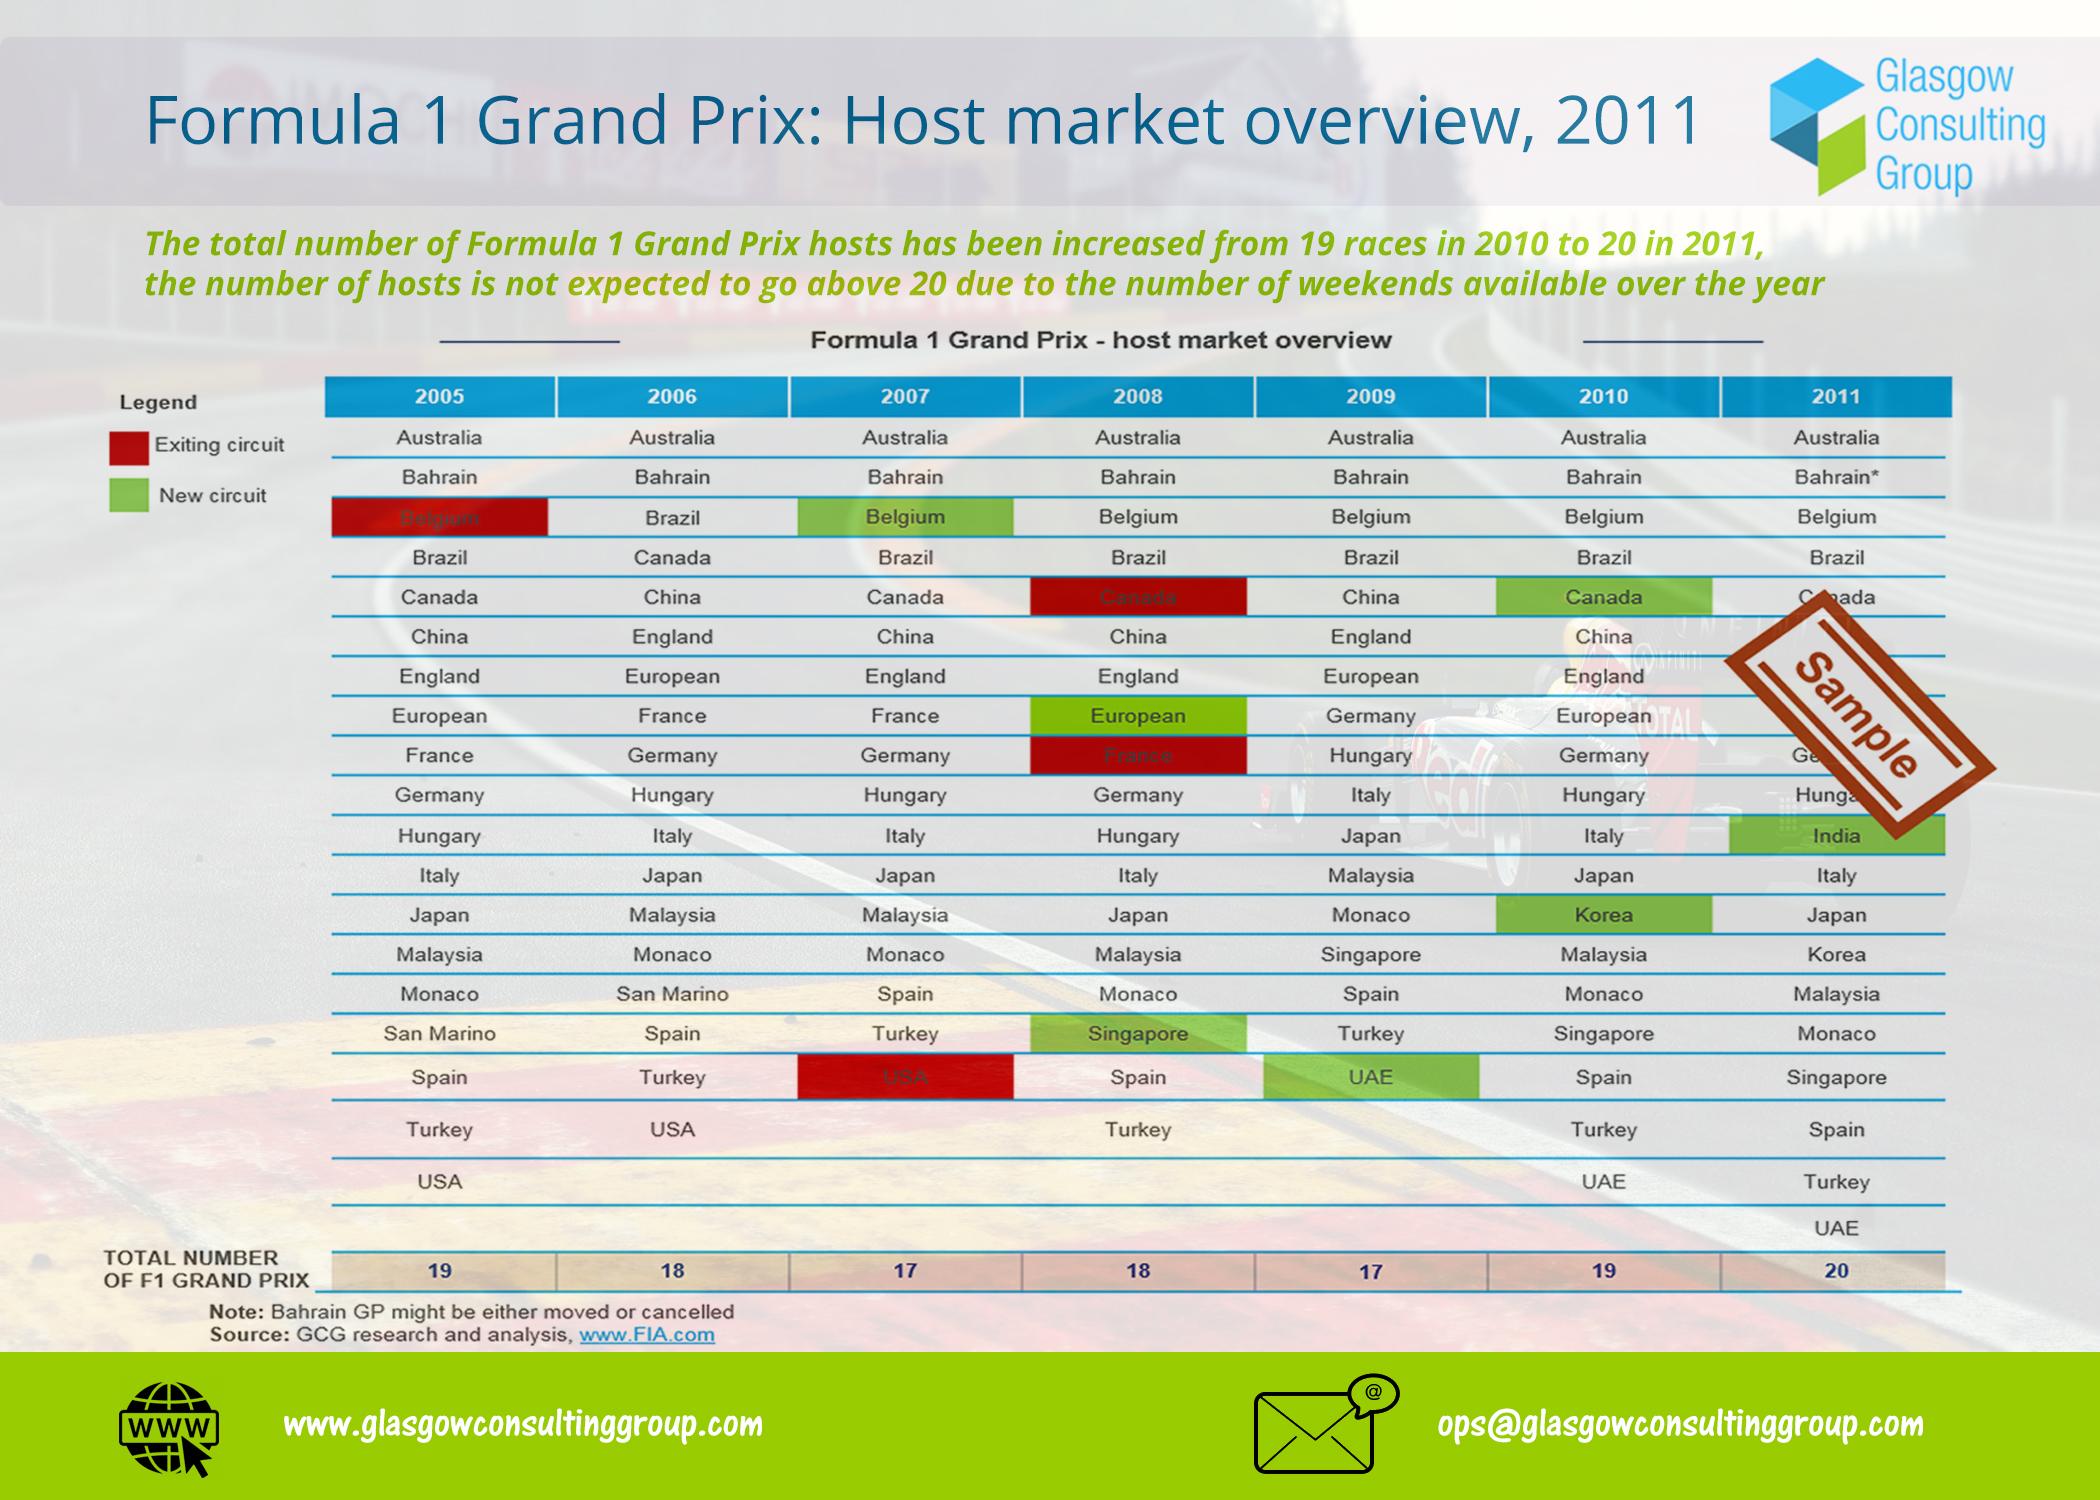 1-F1 Grand Prix Host Market Review 2011